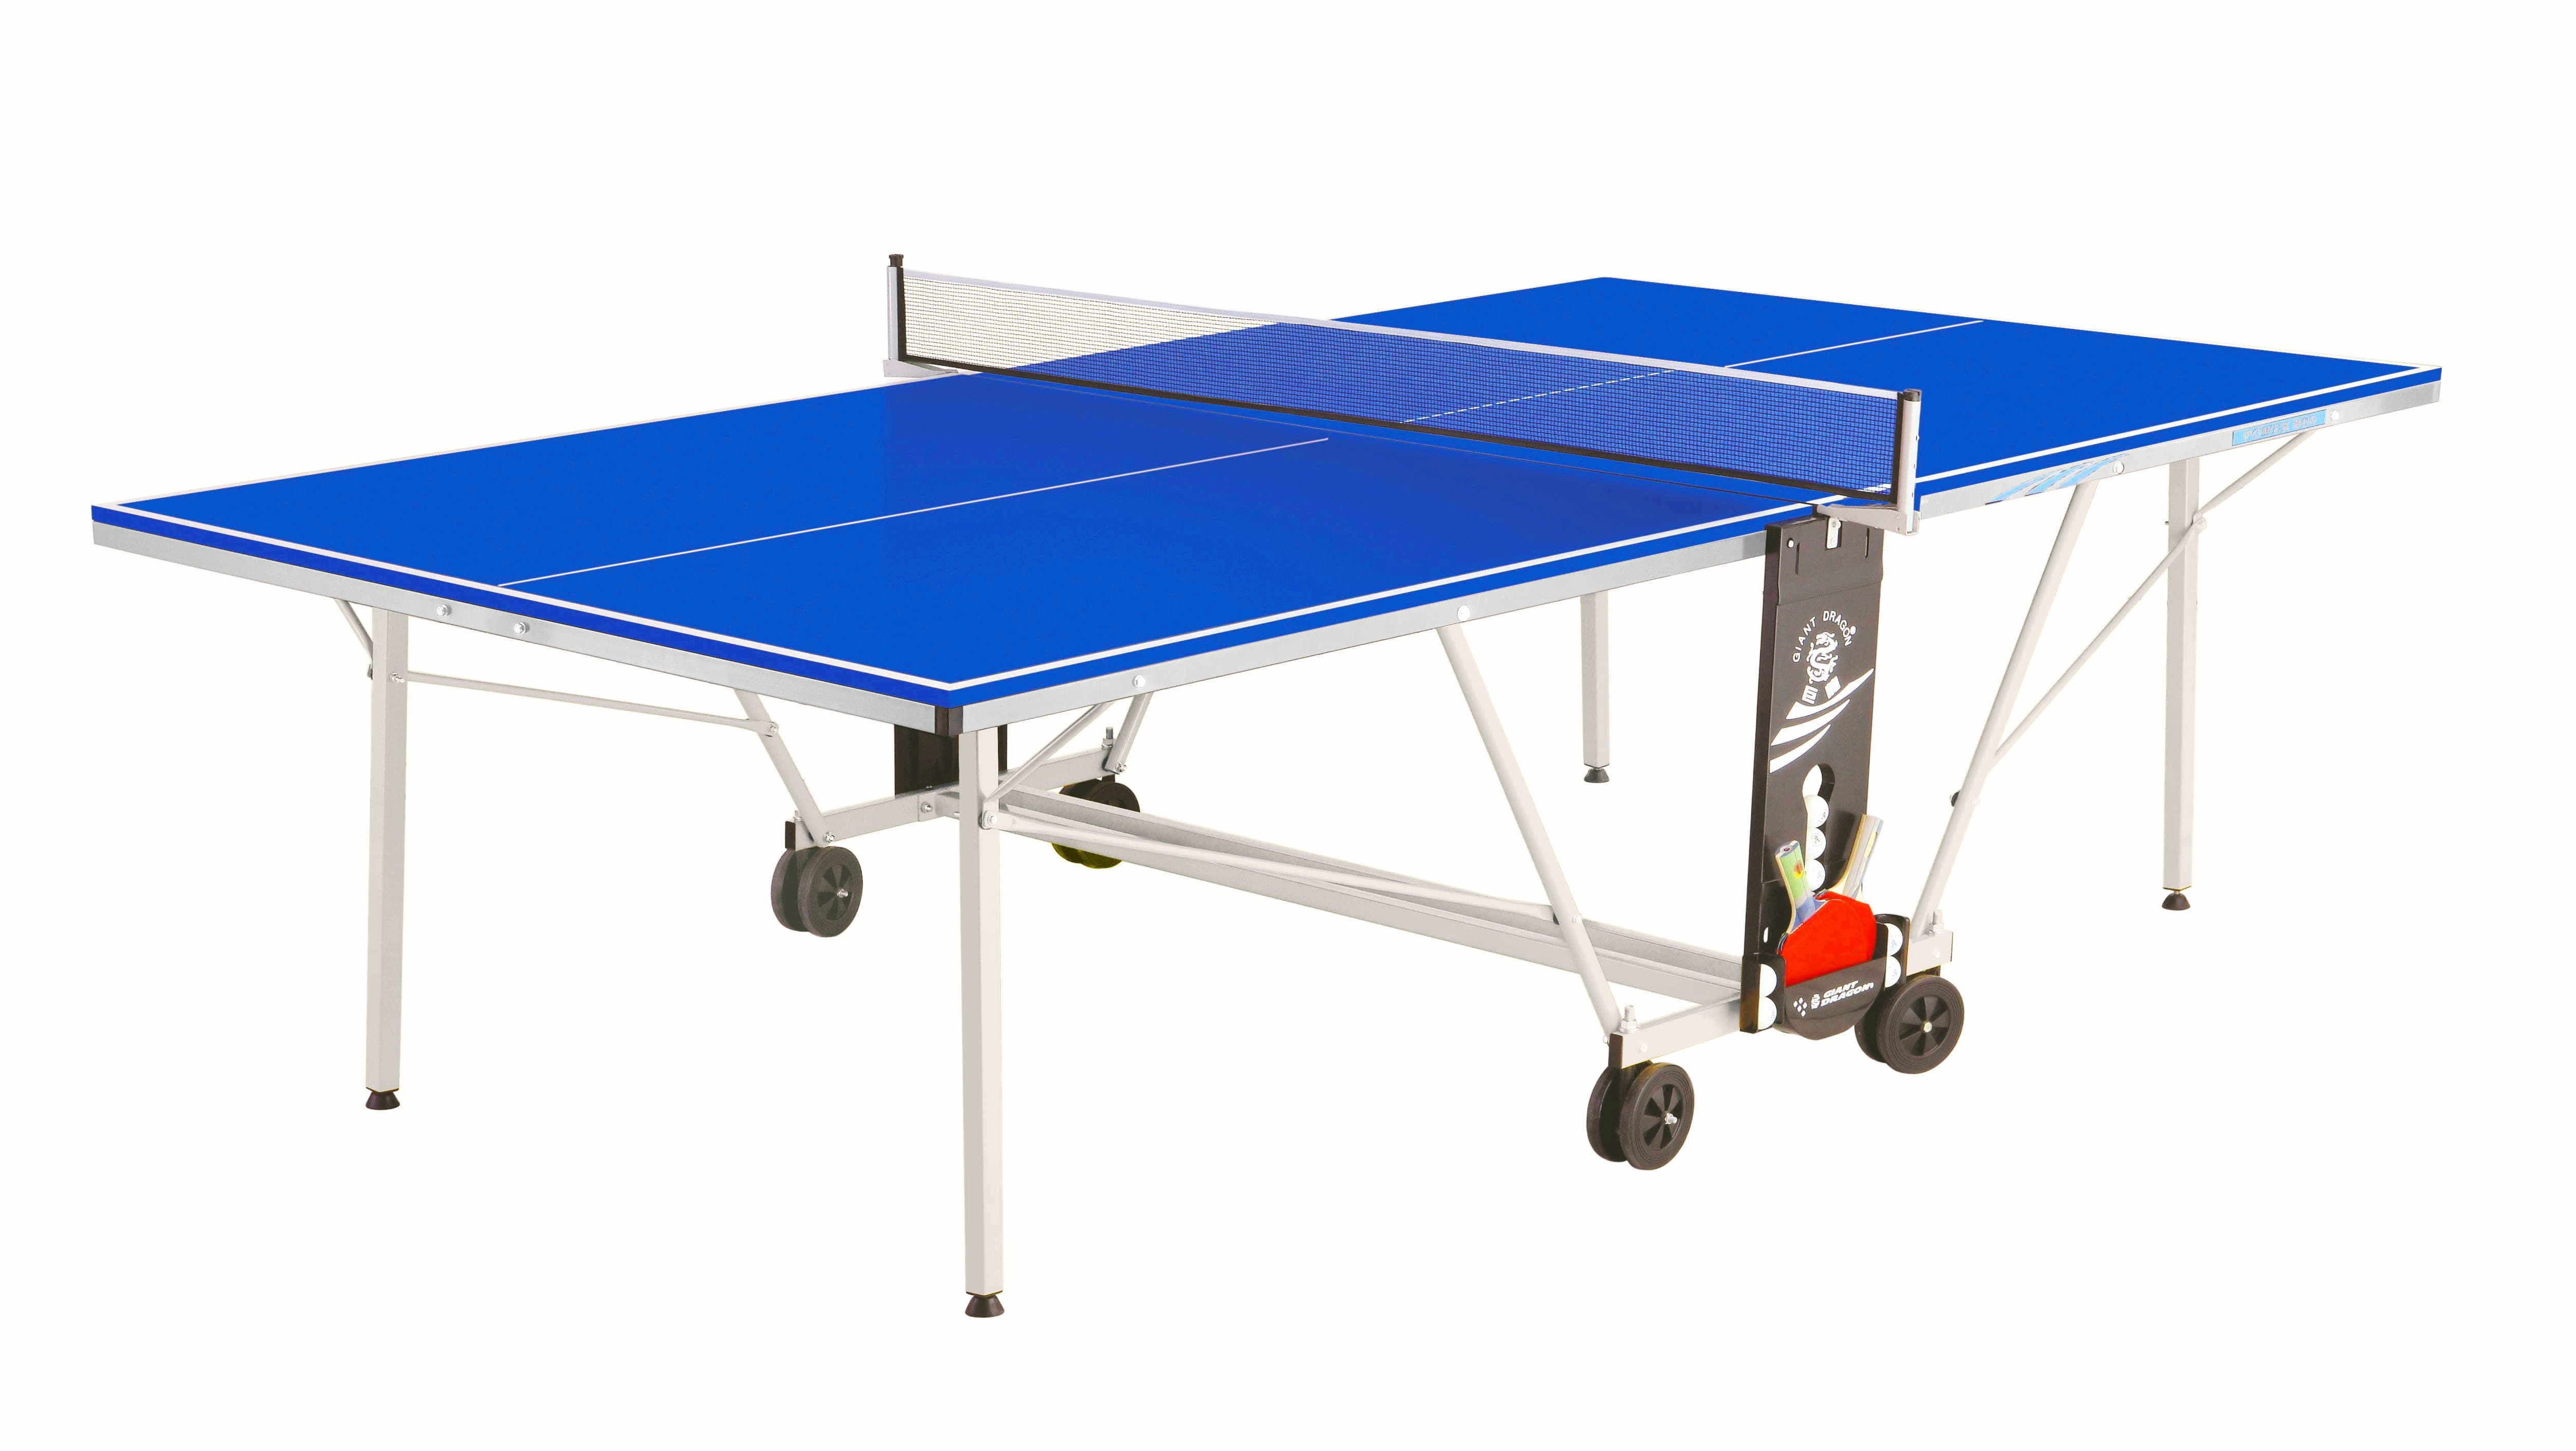 Теннисный стол GIANT DRAGON POWER 800 - Теннисные столы для помещений, артикул:4976